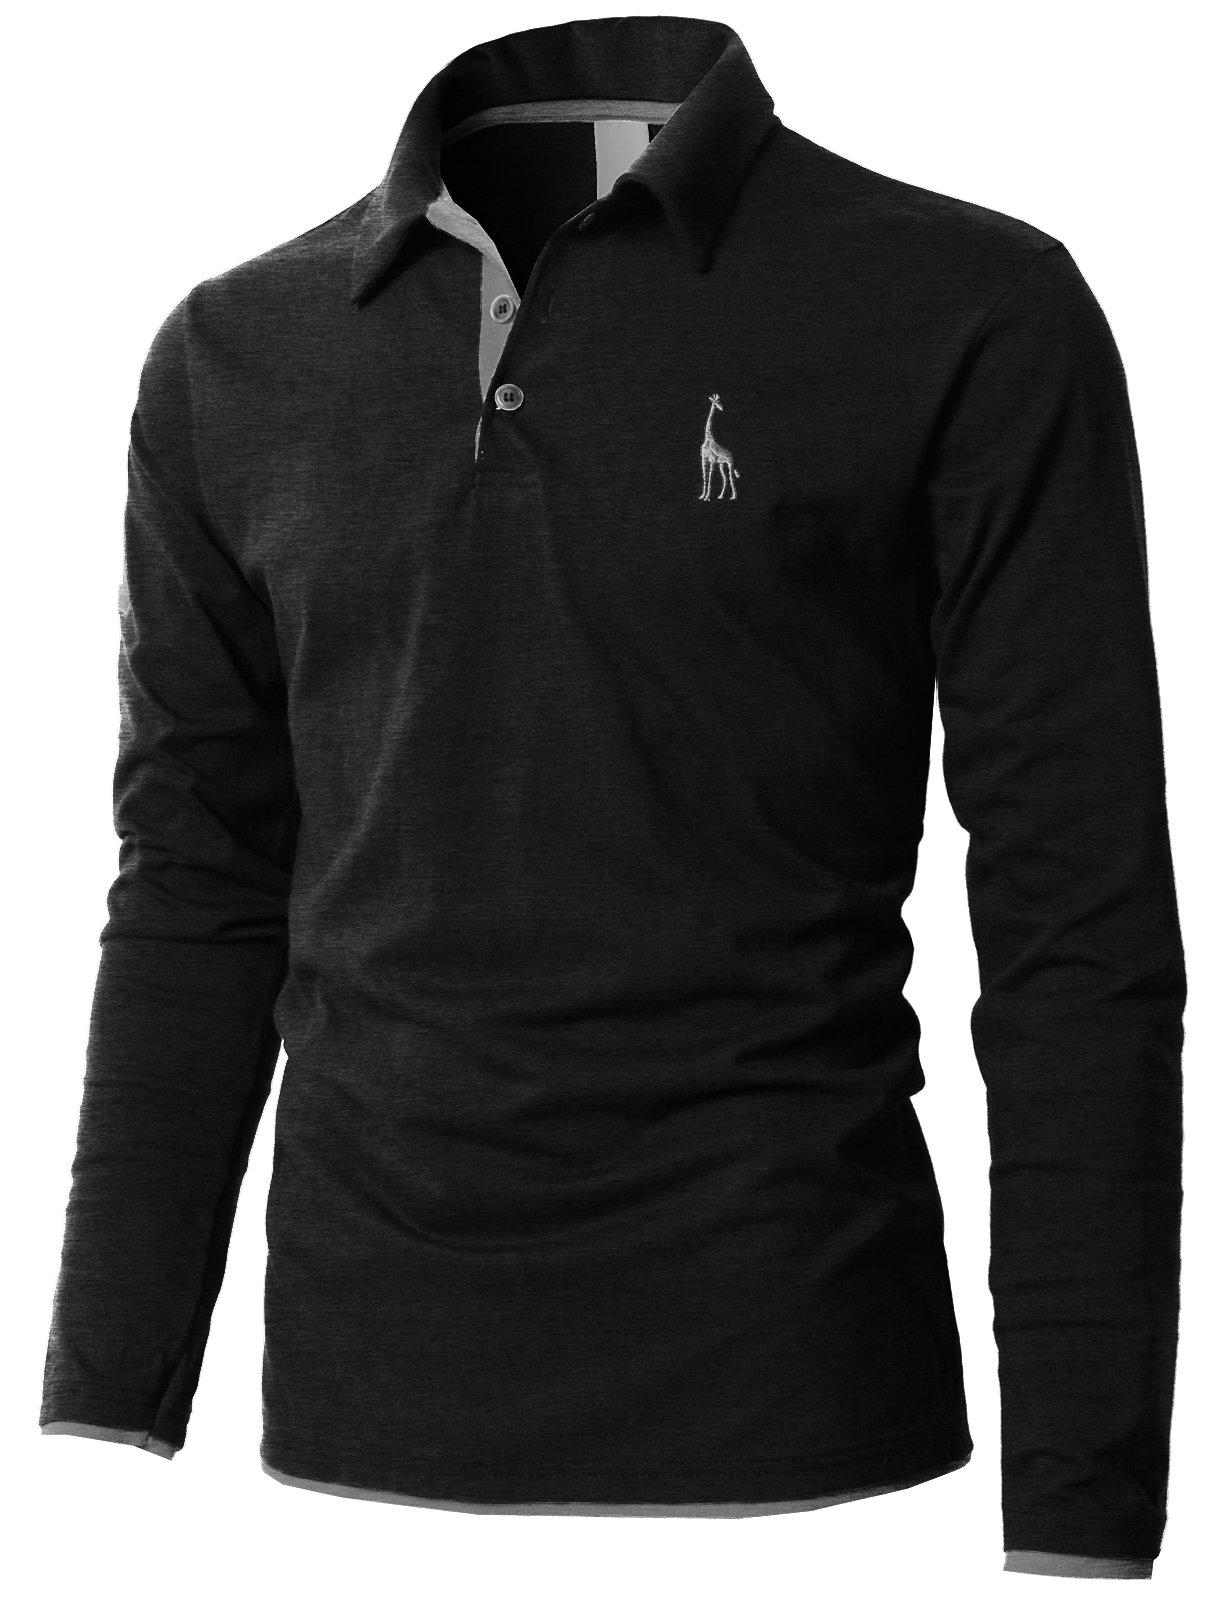 H2H Men's Color Effect Collar Short Sleeve Polo T Shirt Charcoal US L/Asia 3XL (KMTTL0452)